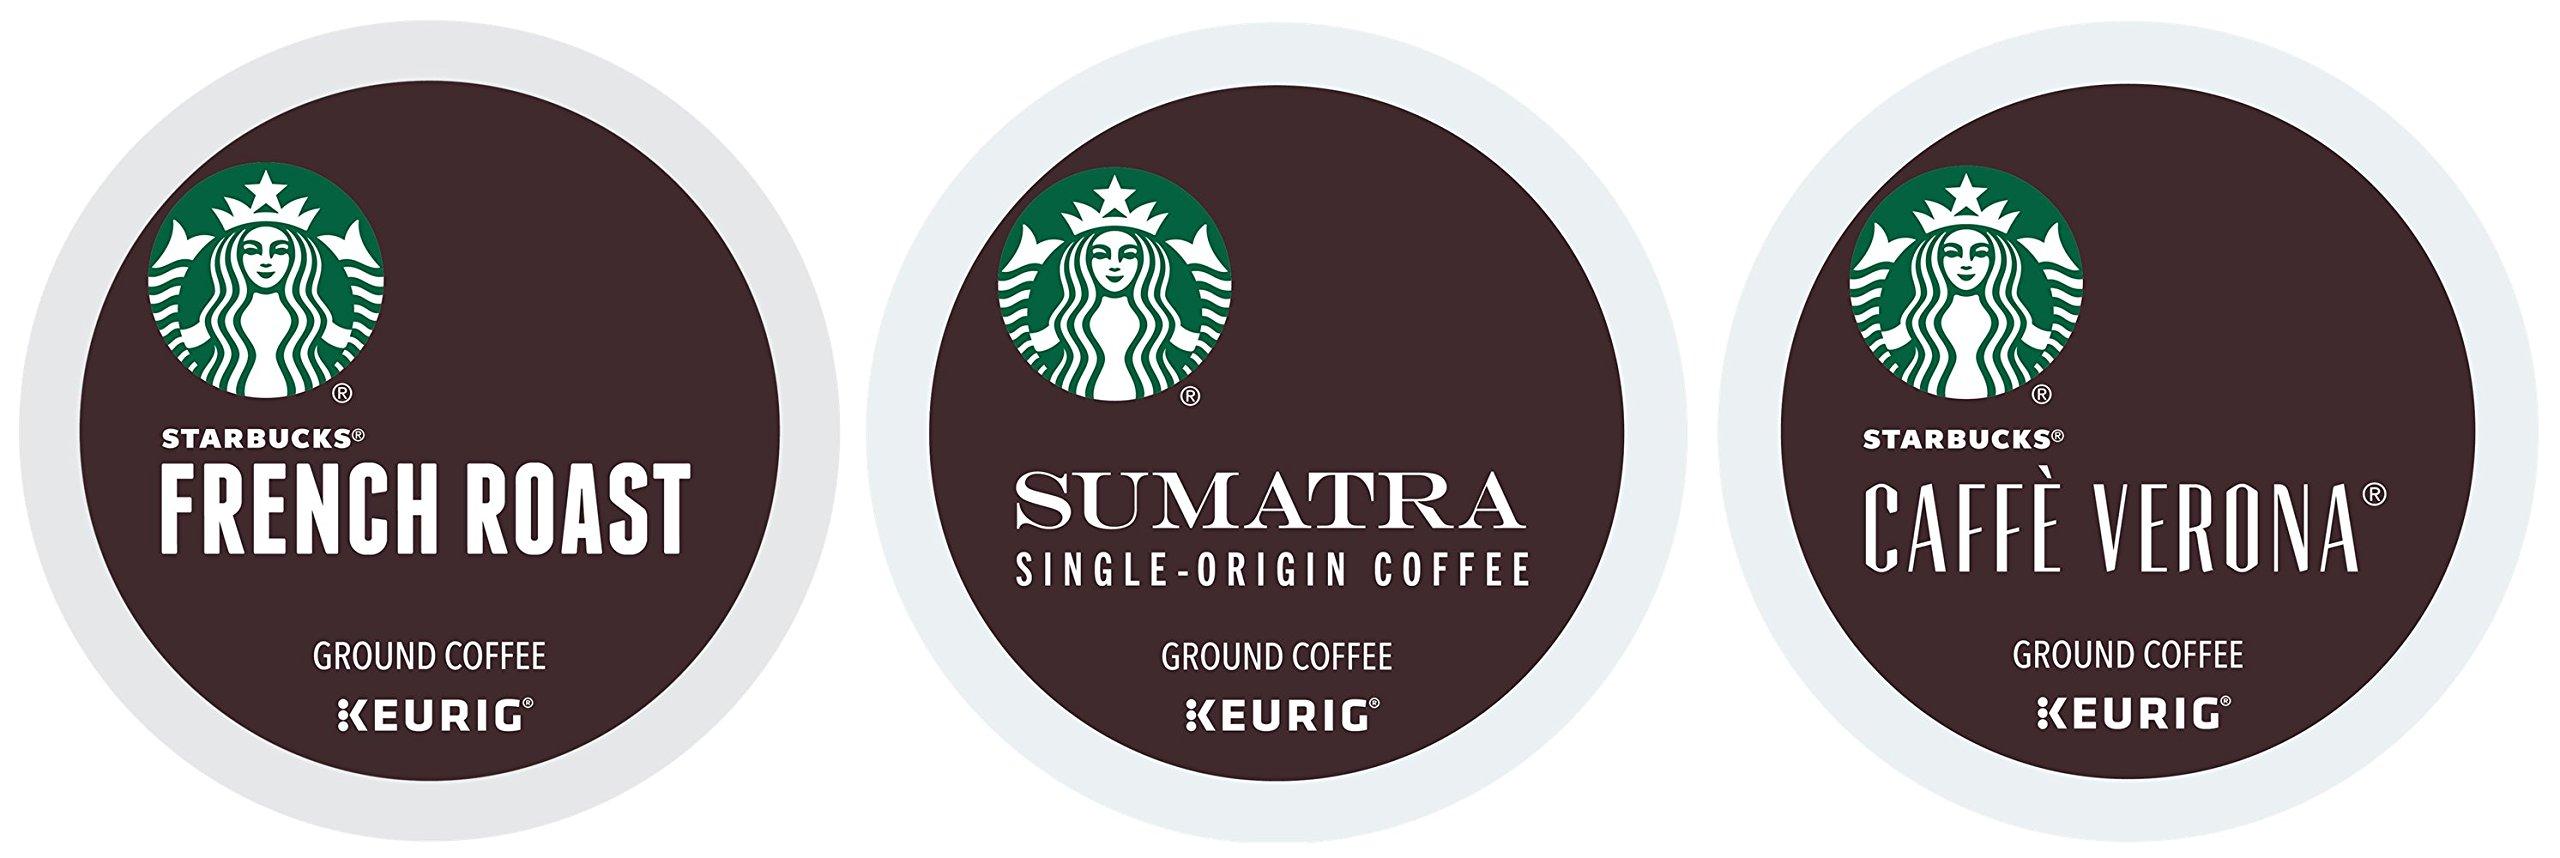 Starbucks Variety Coffee K-Cup Featuring 3 Dark Roast for Keurig Brewers - French Roast, Sumatra, Caffe Verona LfBDre, 4Pack (144 Count)